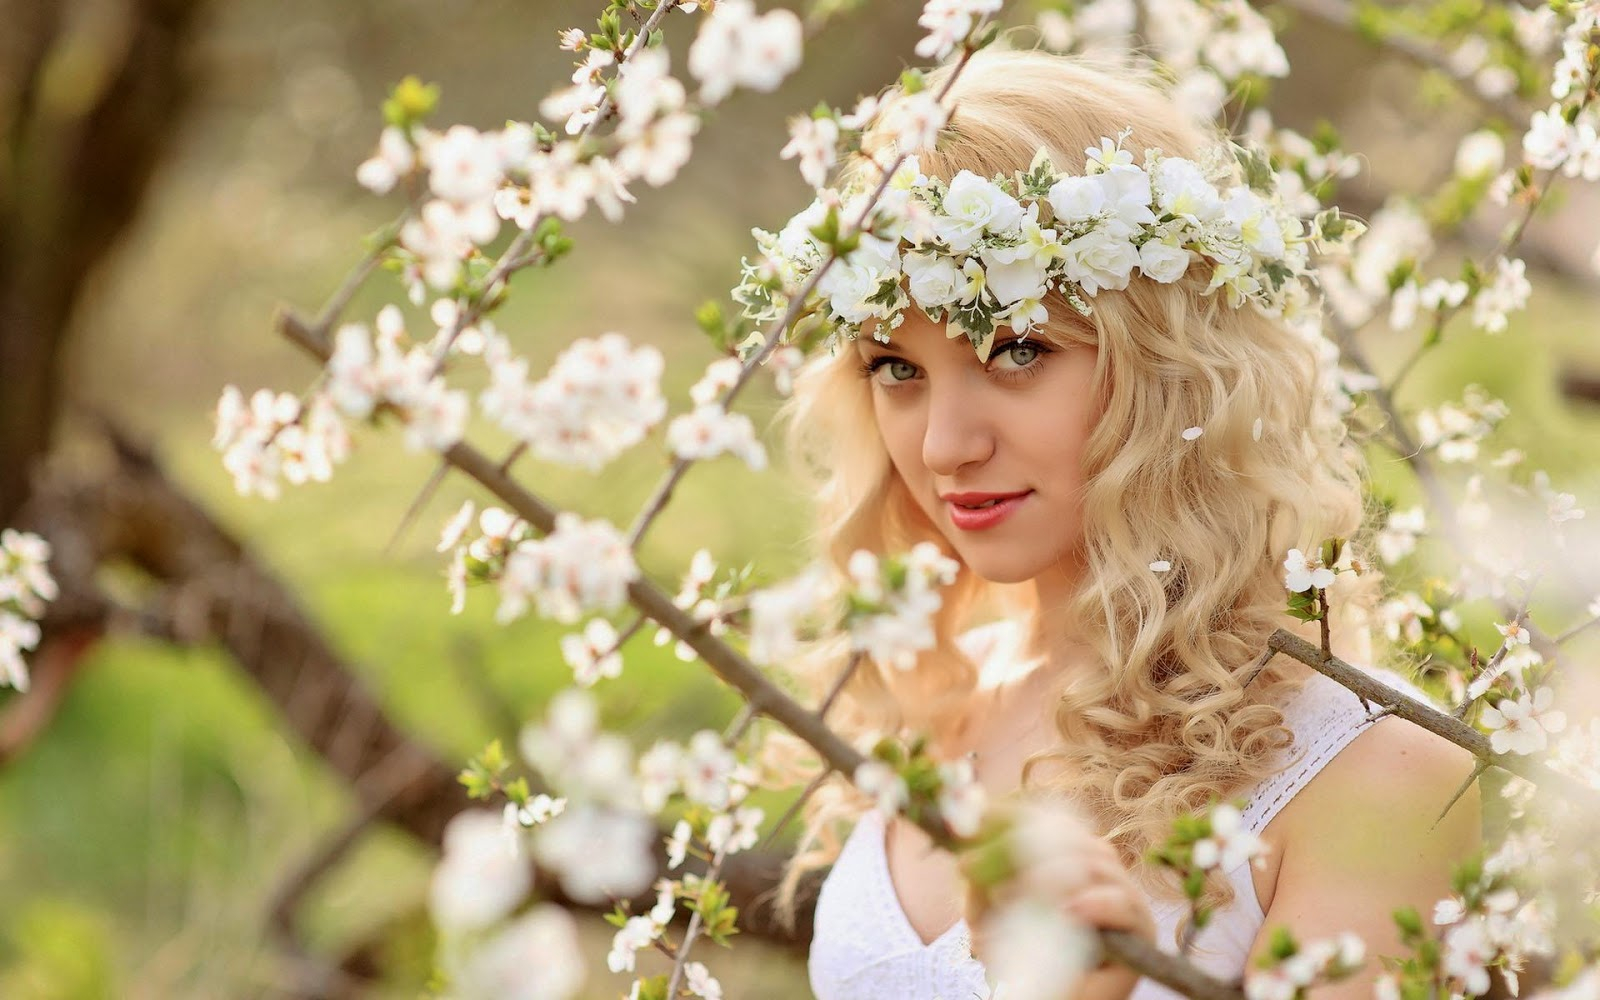 Beautiful natural flower beautiful nature beautiful natural flower izmirmasajfo